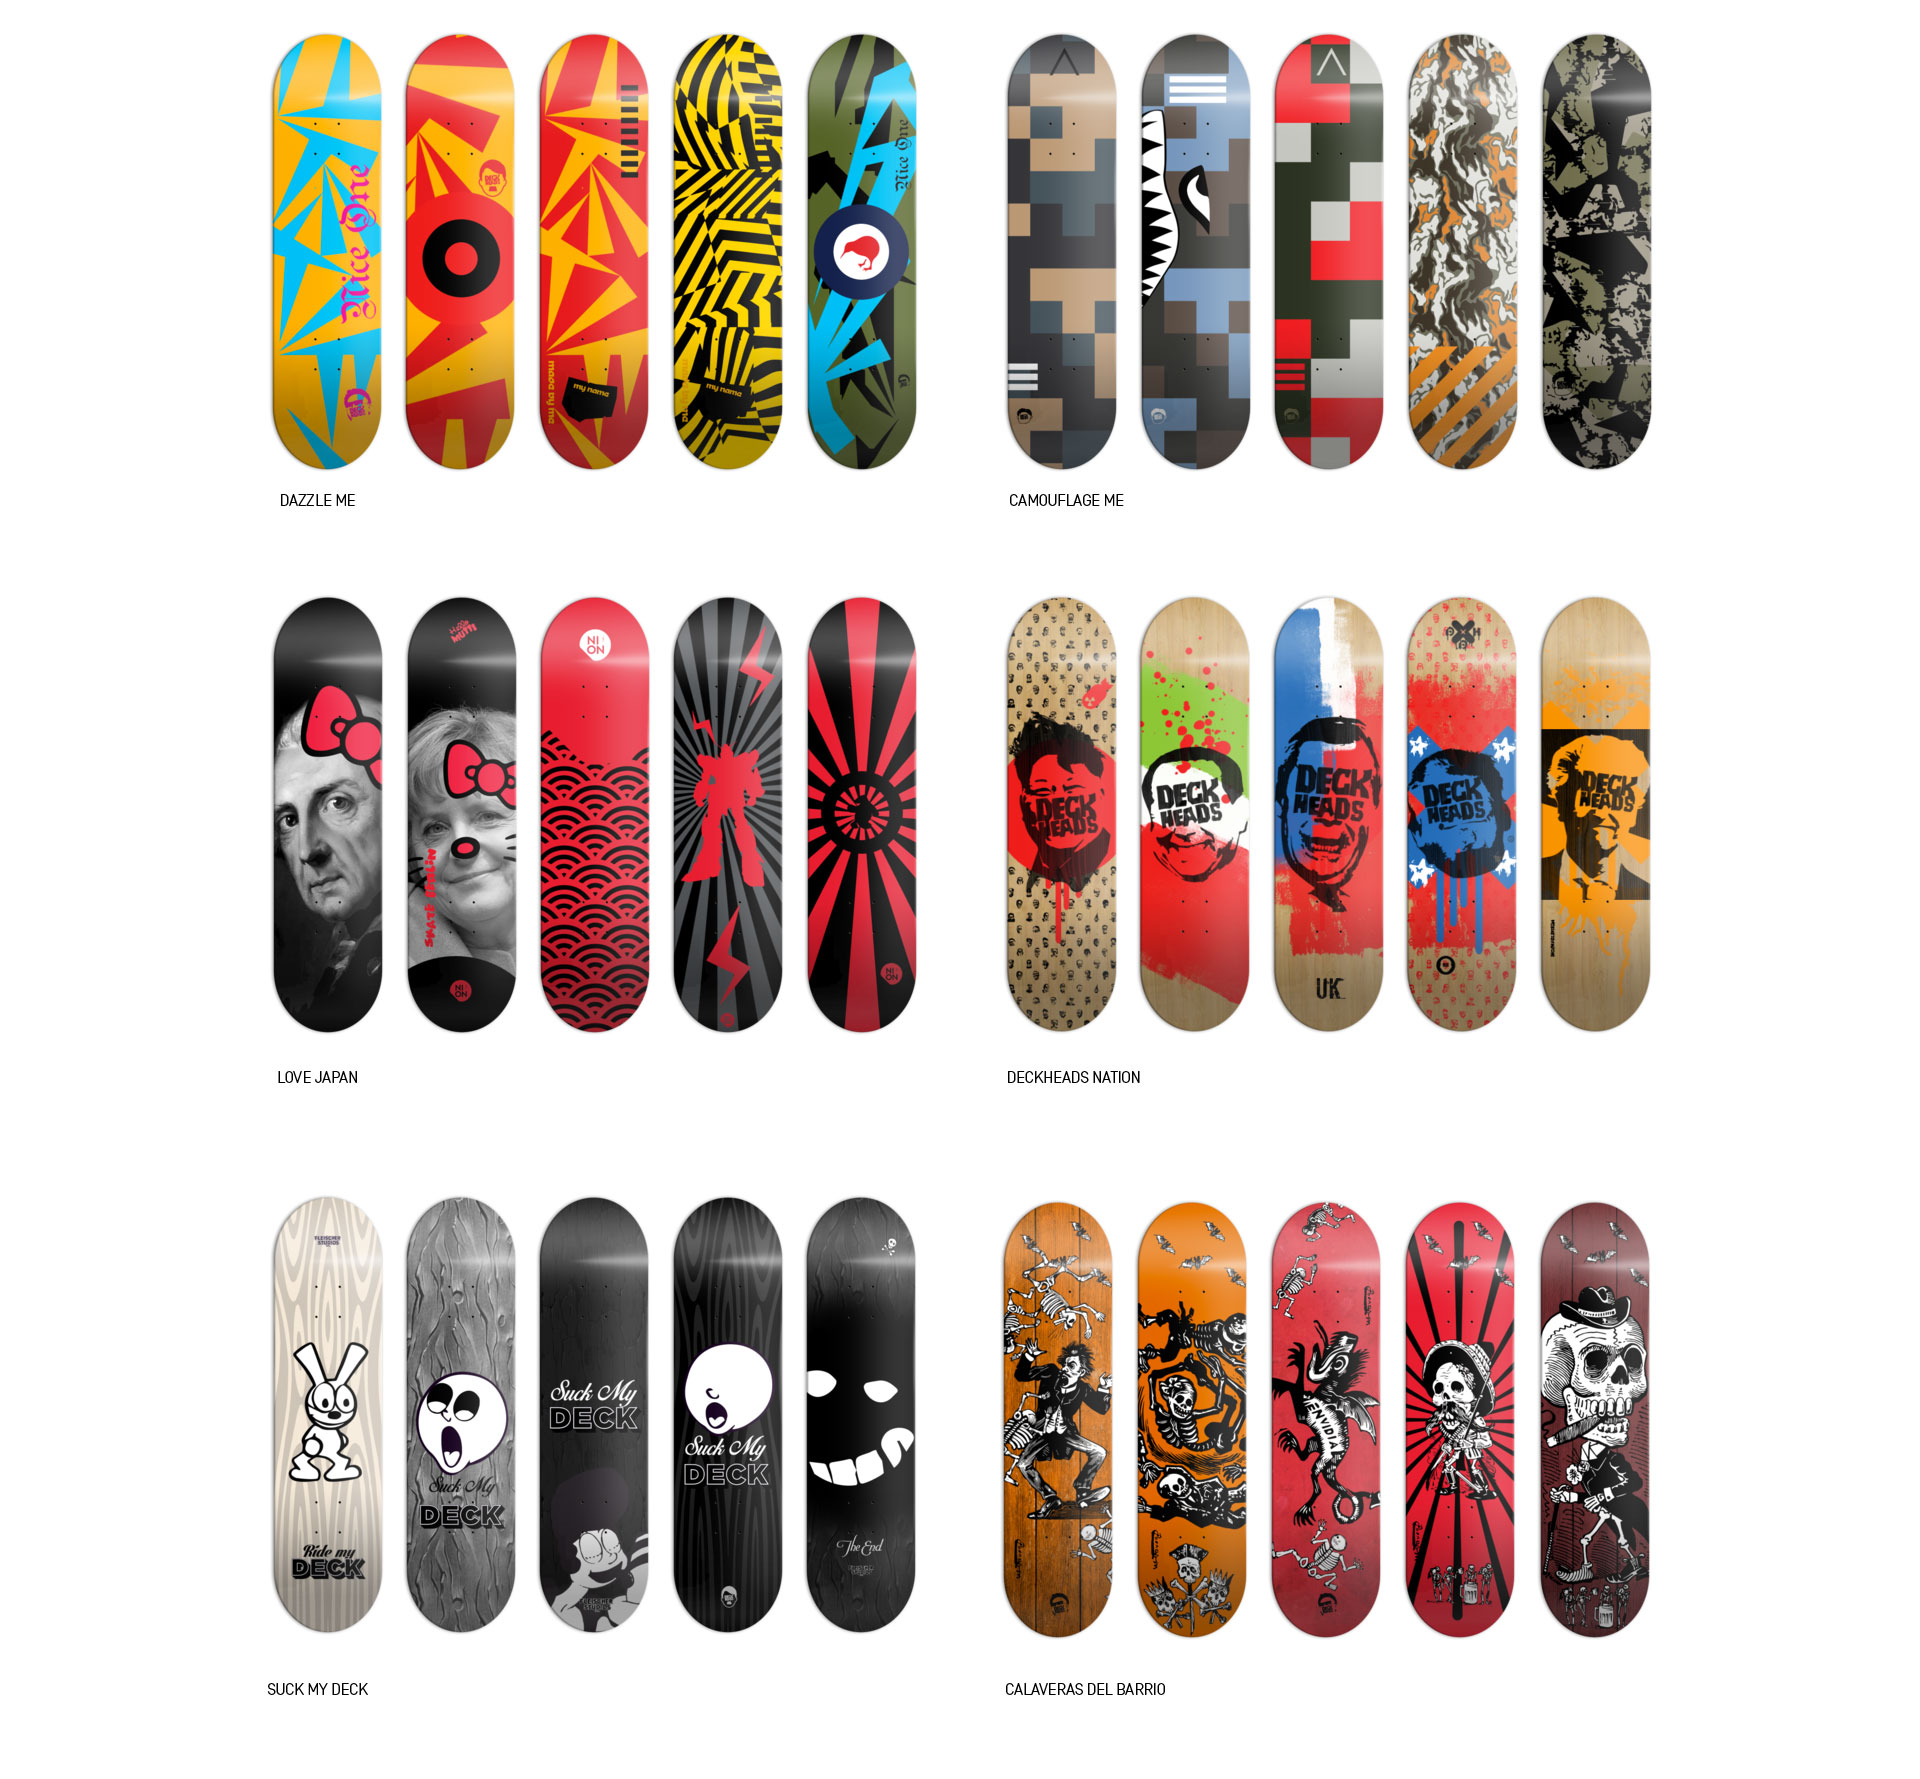 meyer miller smith skateboard customization